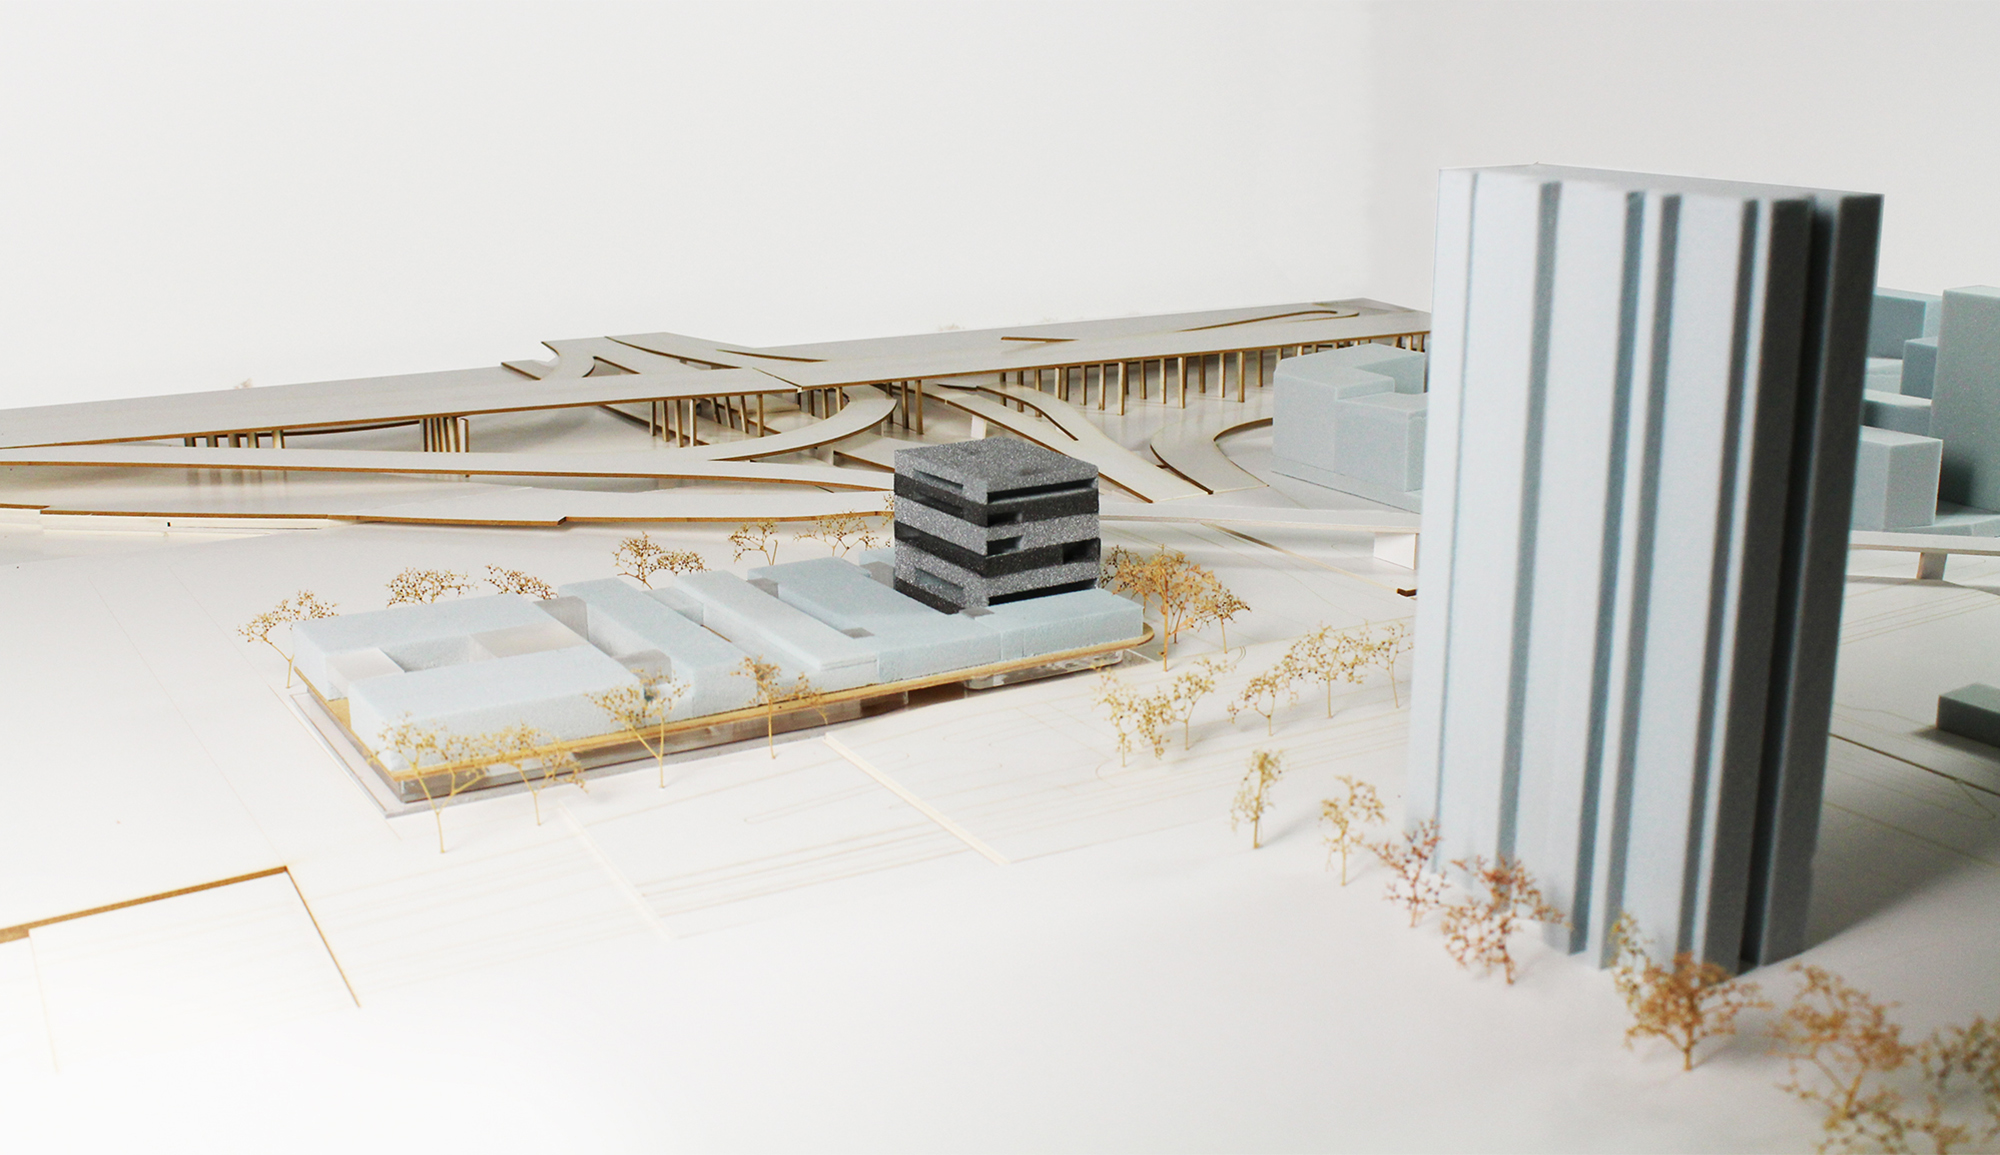 Model, topography - Condorcet Campus - Josep Lluís Mateo